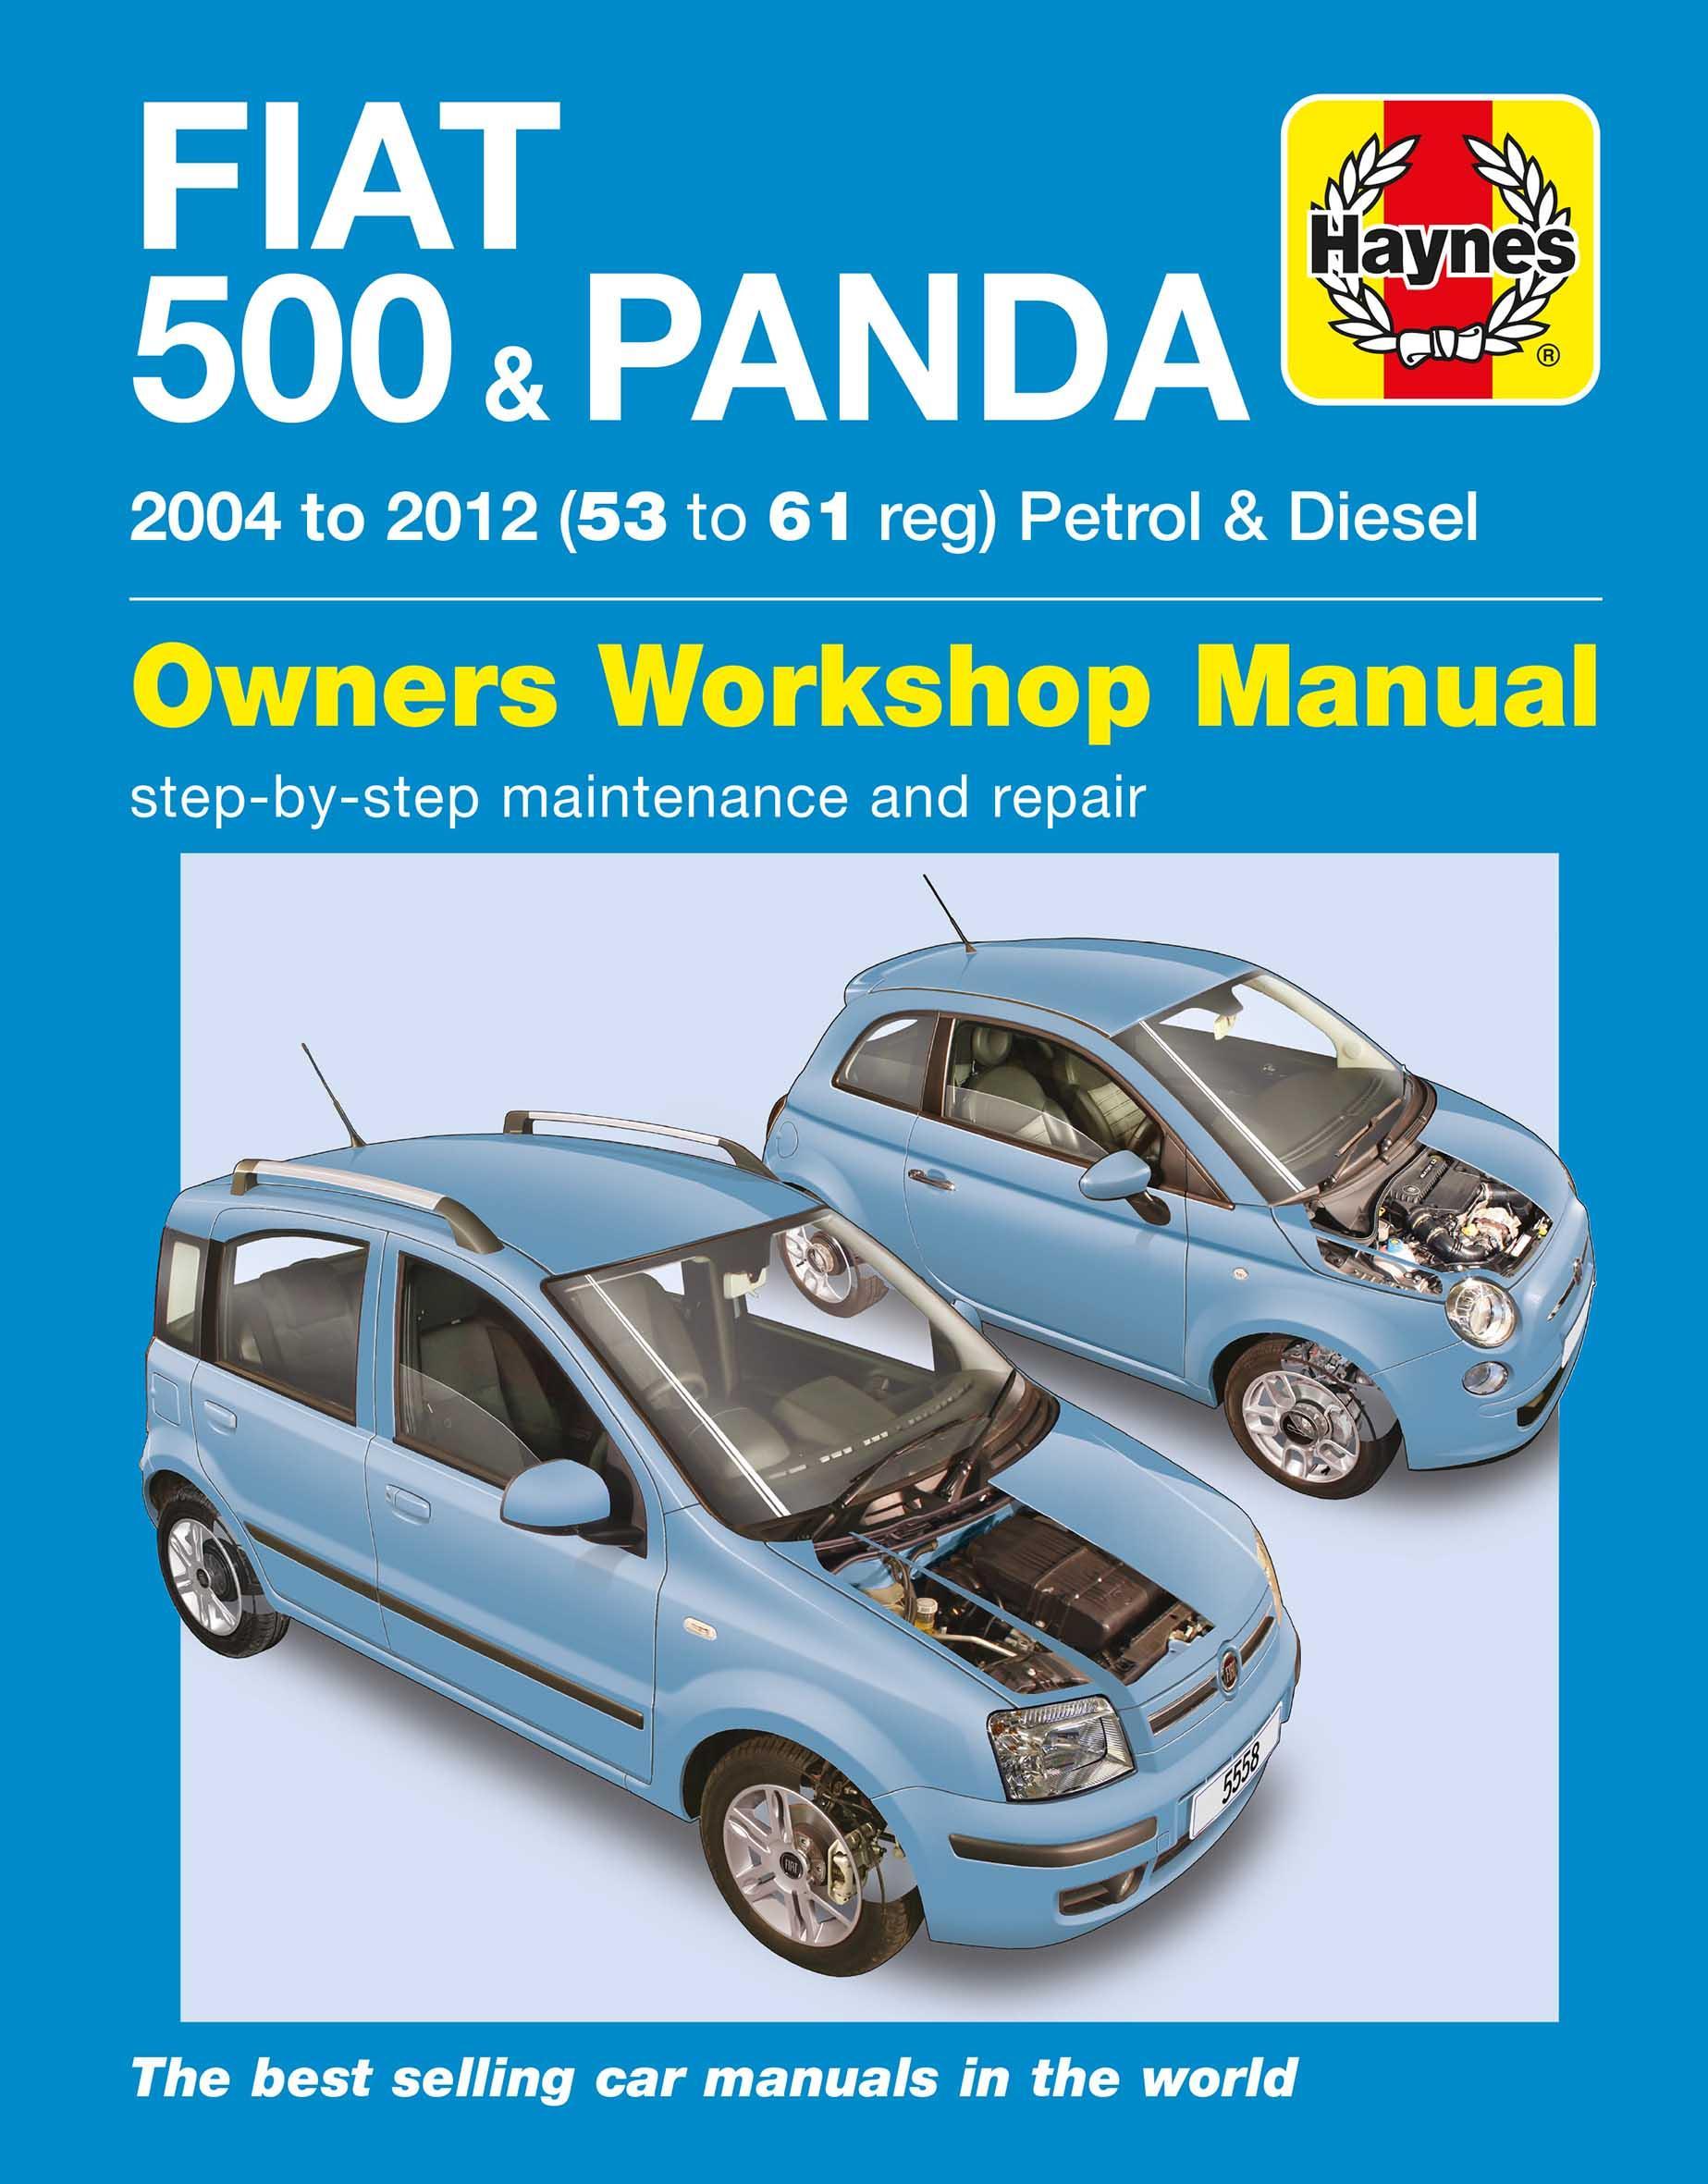 haynes fiat 500 panda 04 12 m rh halfords com Fiat 500 Stick Shift Abarth Manual